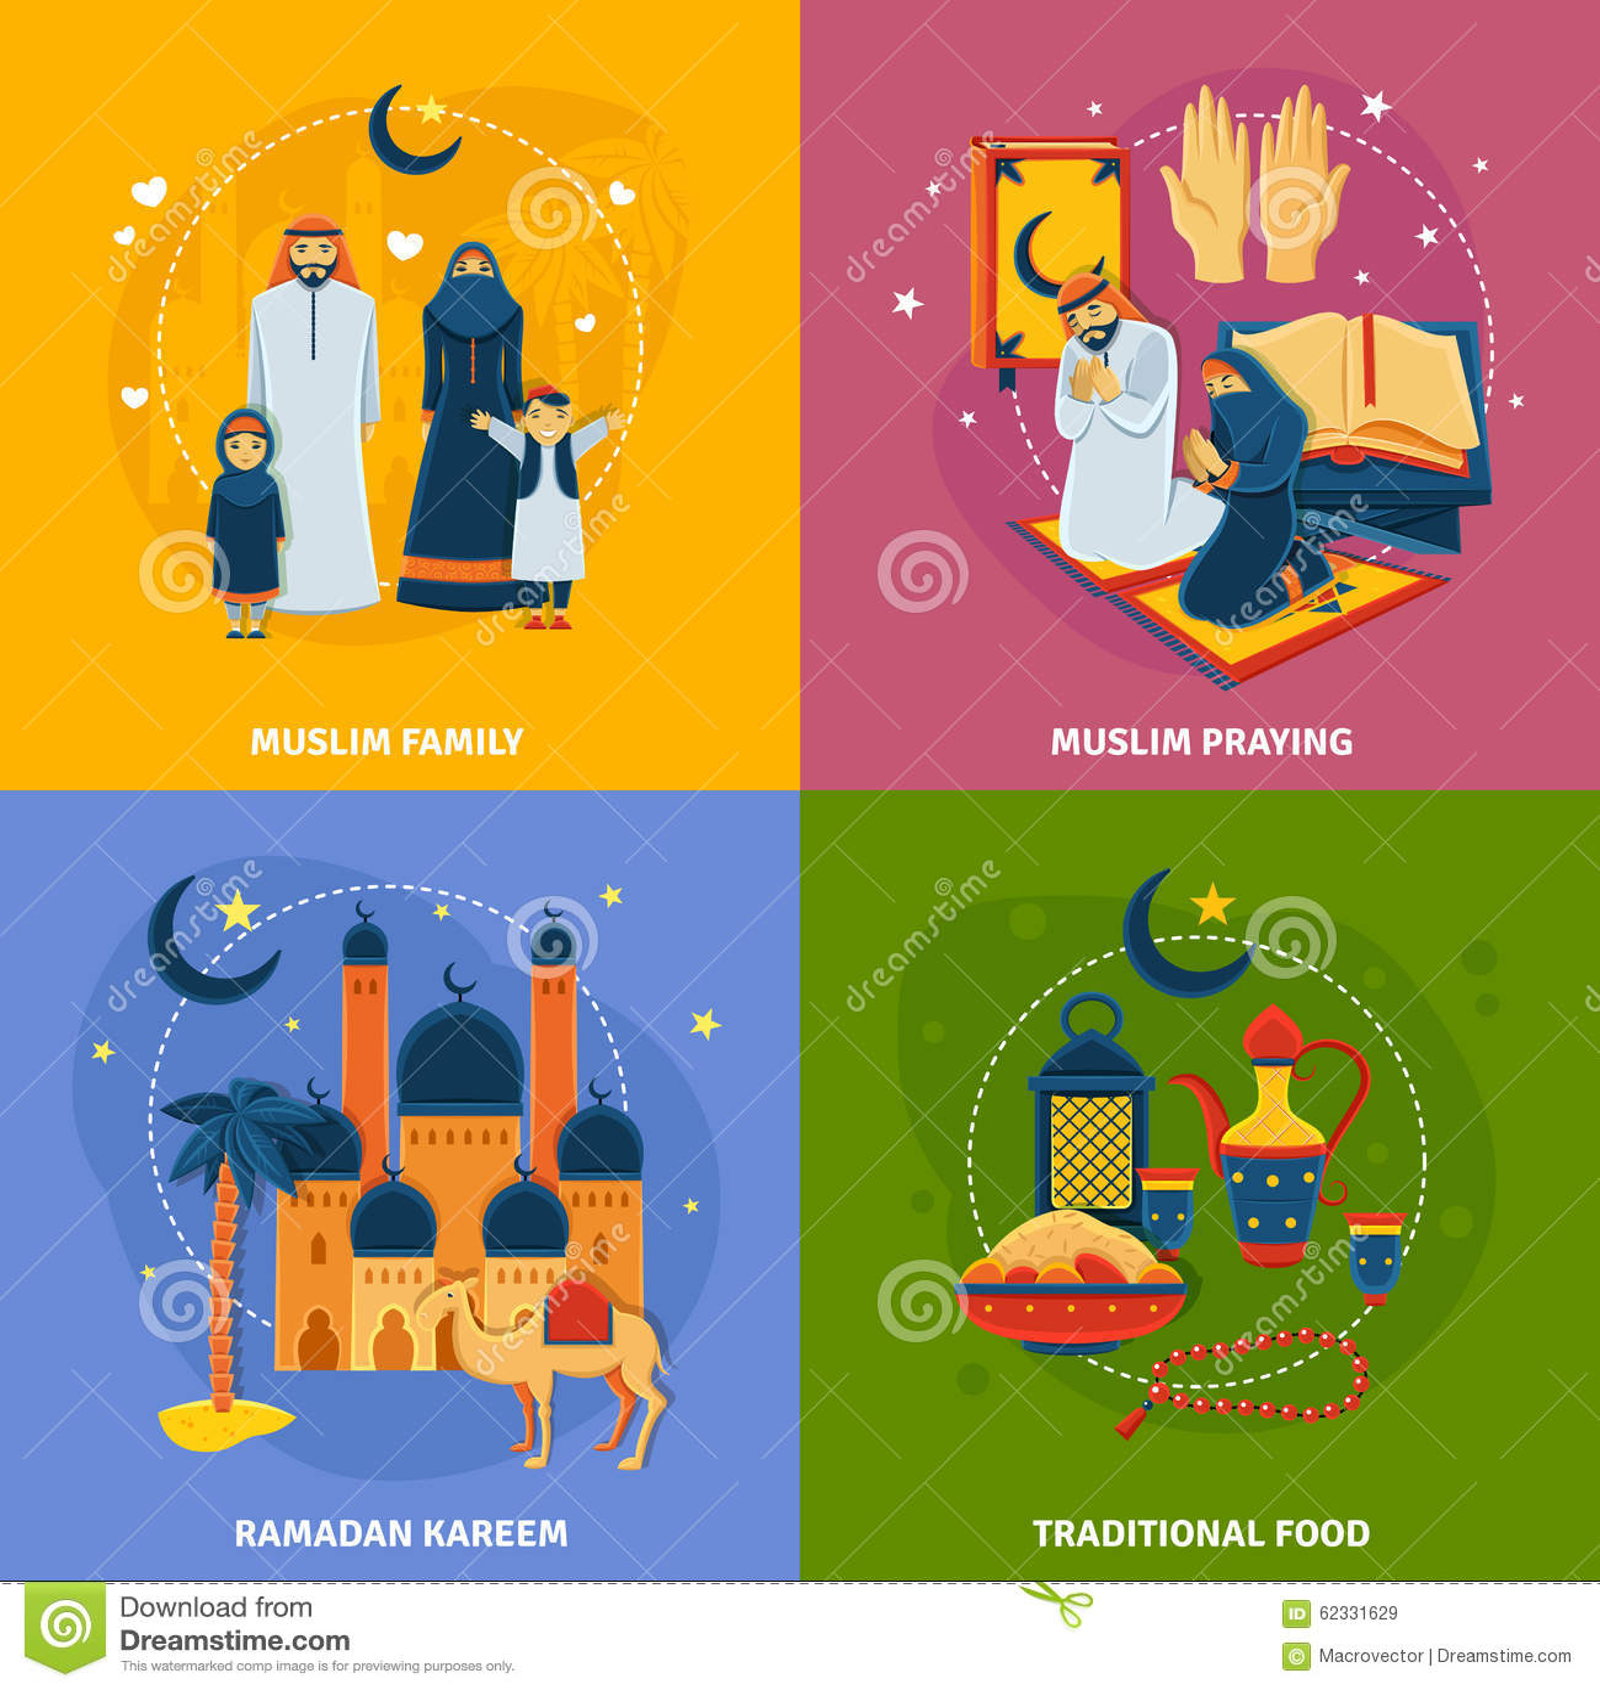 Ramadan Food Worksheet